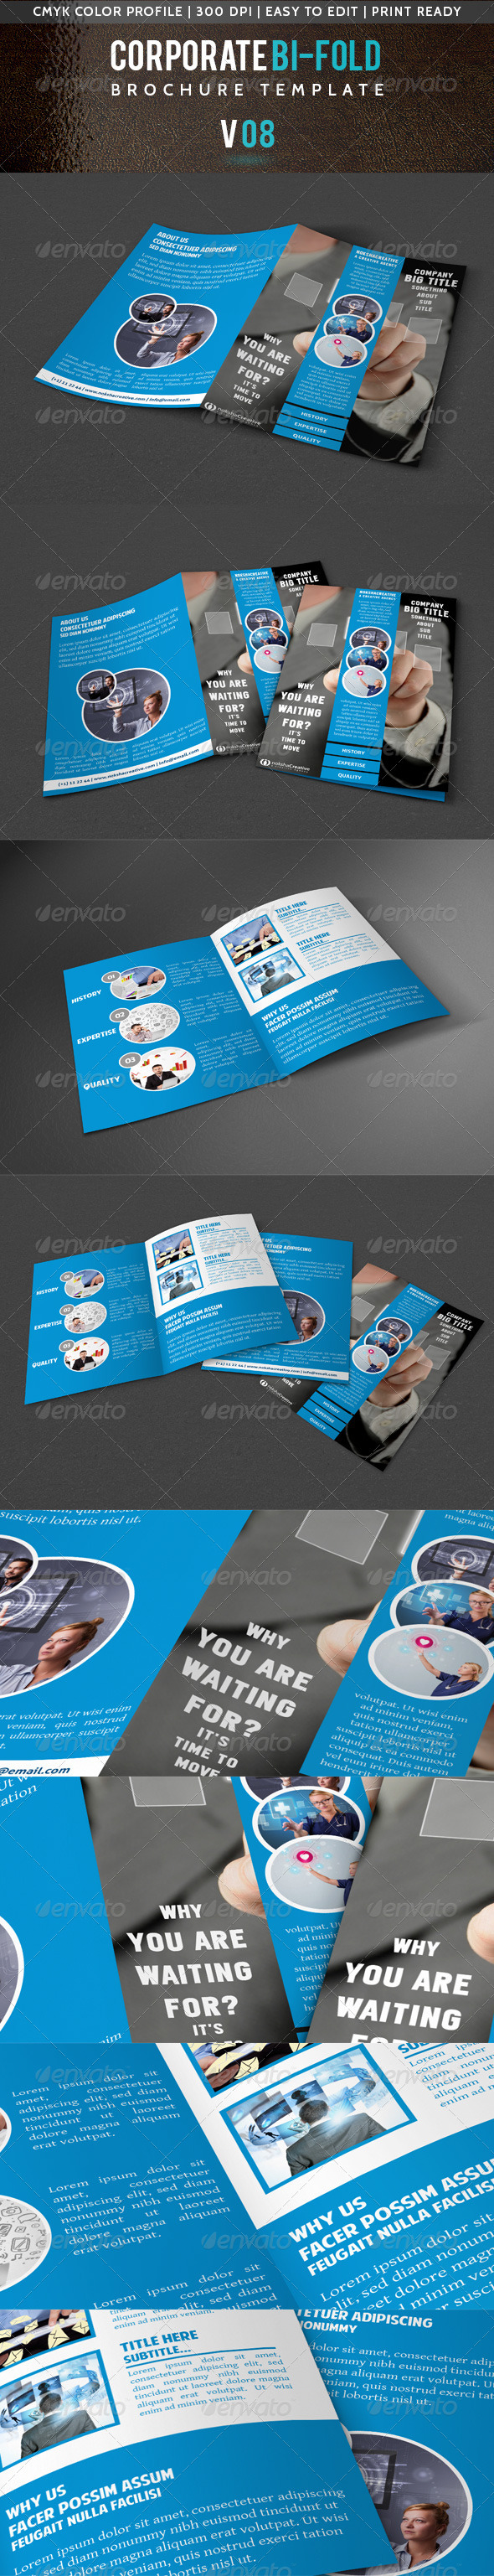 Corporate_Bi-Fold_Brochure_V_08 - Corporate Brochures